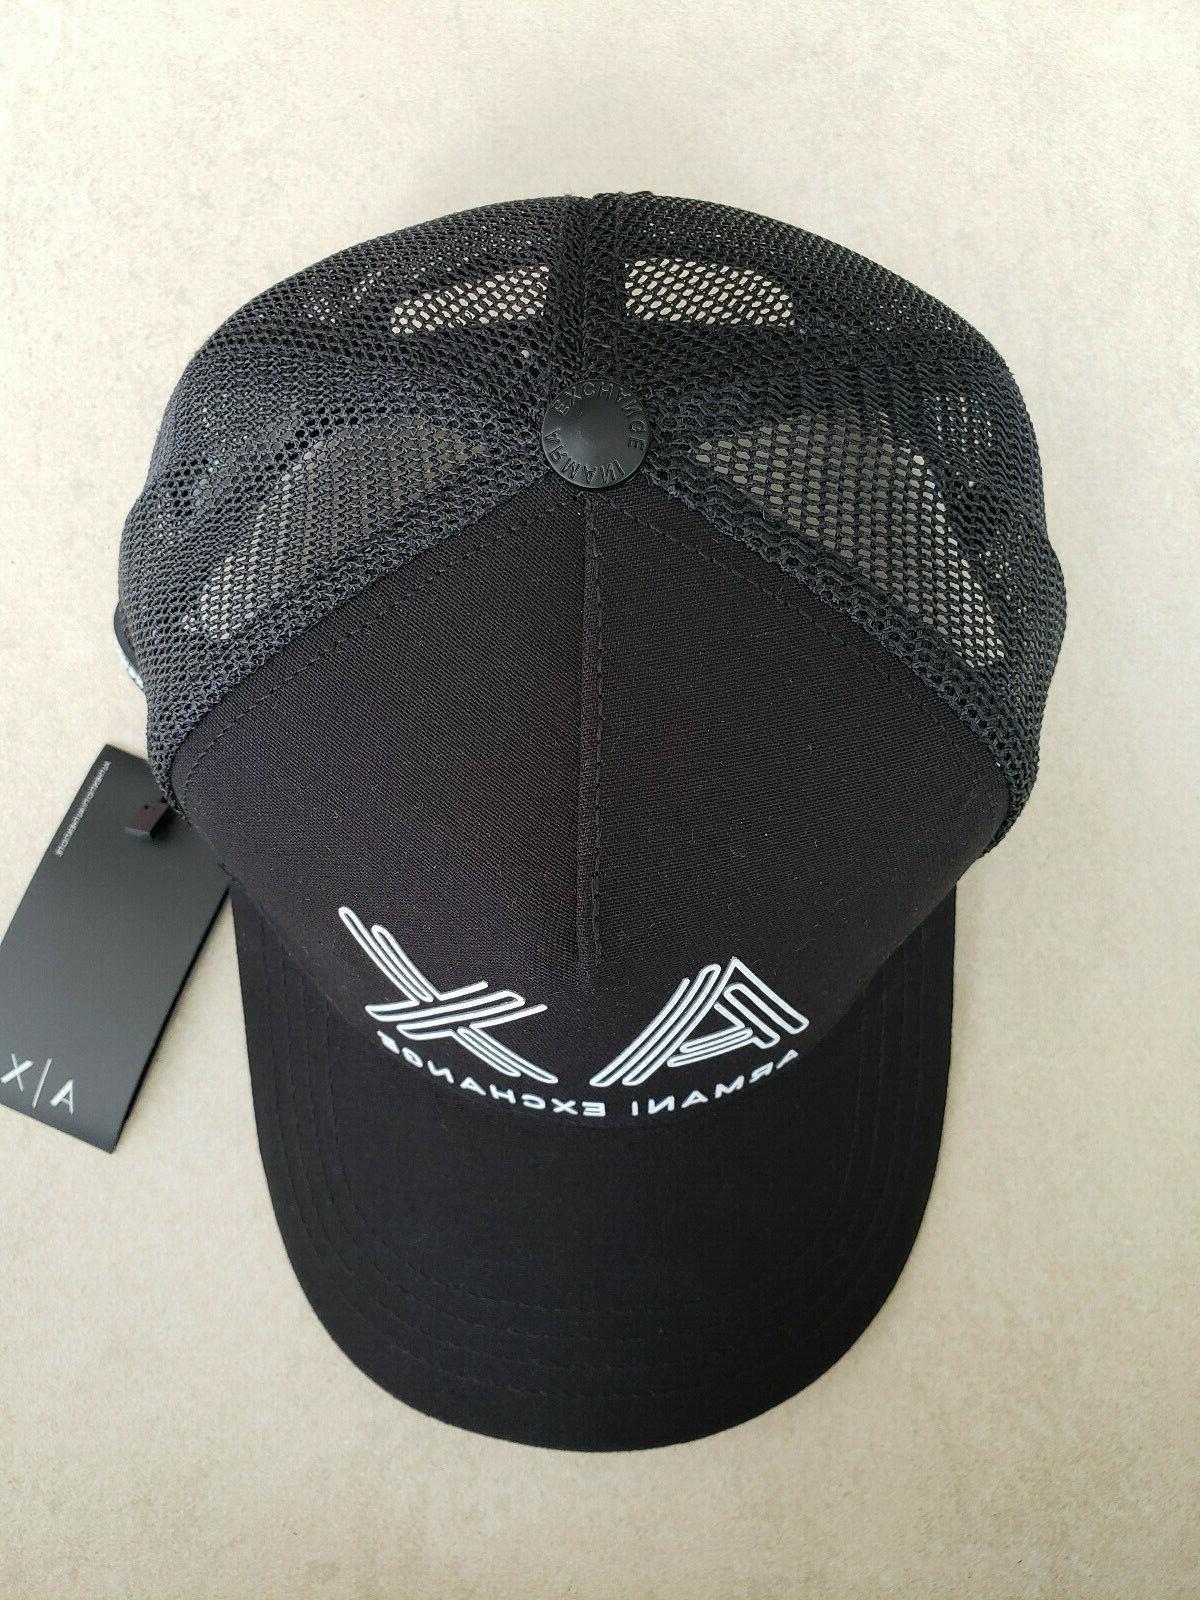 Armani A|X Men's Black Baseball Cap/Hat